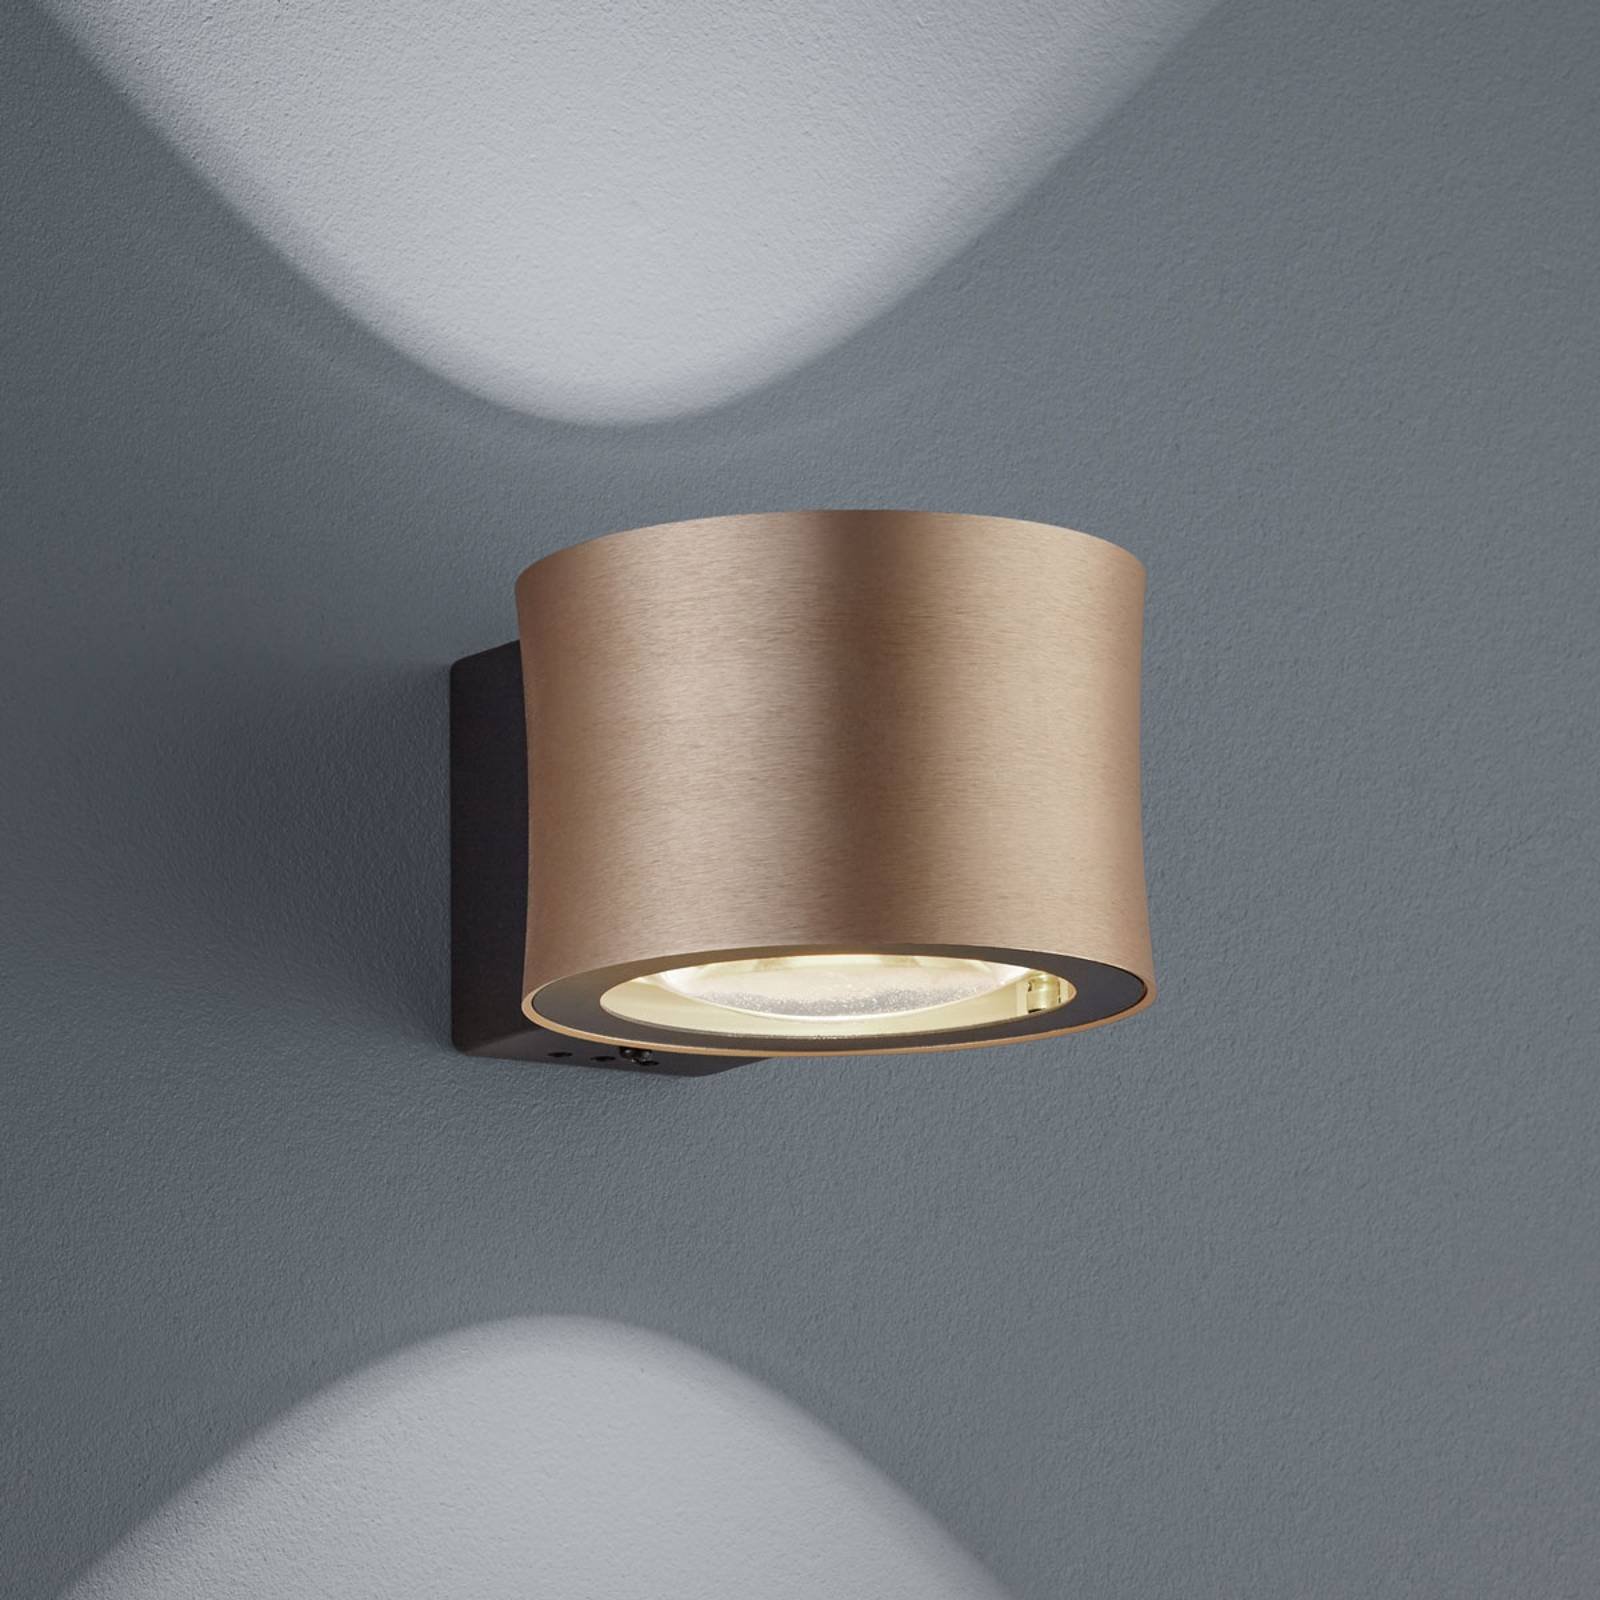 BANKAMP Impulse LED-seinävalaisin ruusukulta